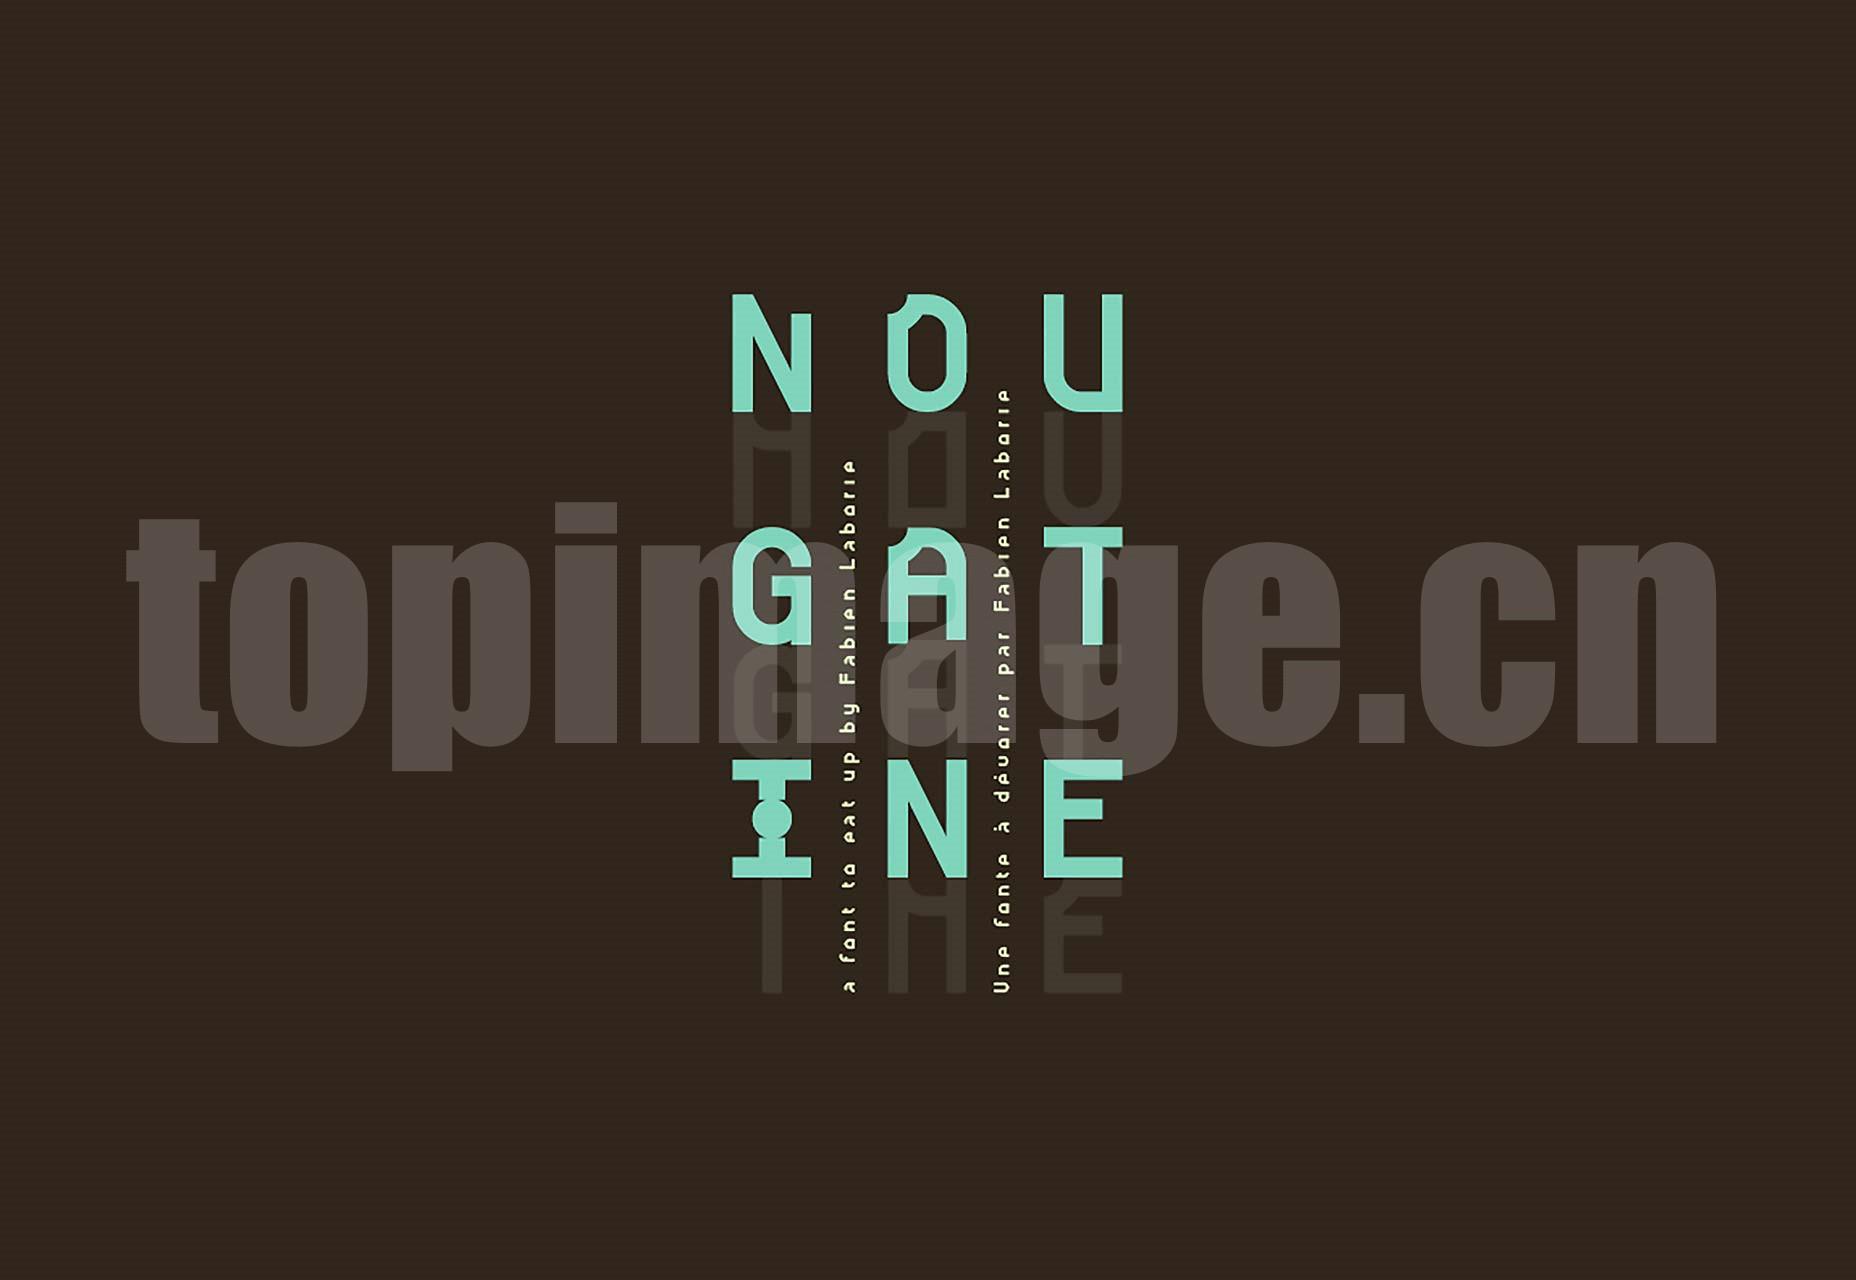 nougatine 海报logo创意字体英文字体下载